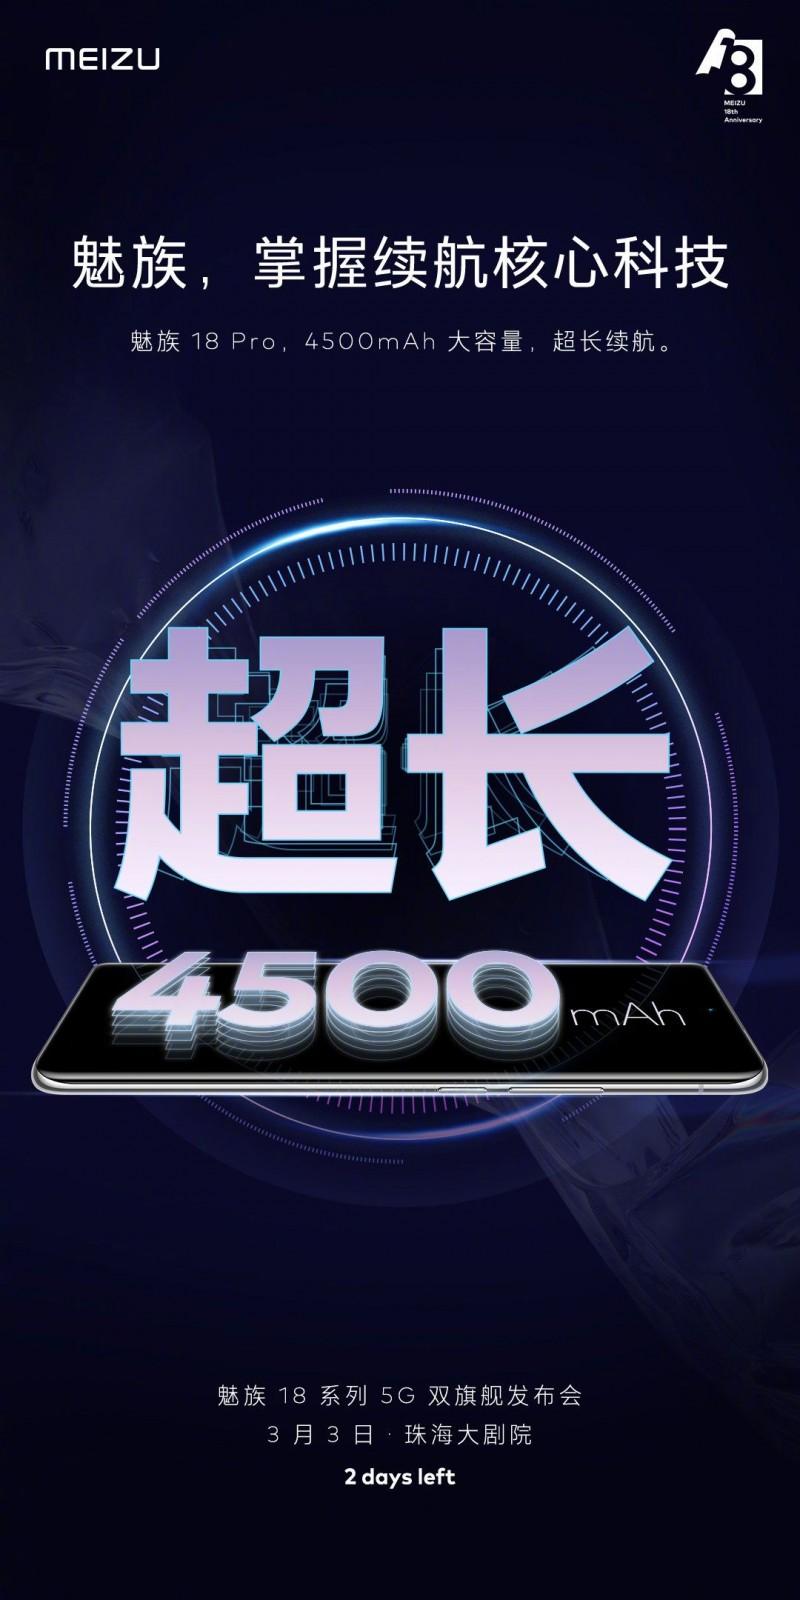 Meizu confirms 4,500mAh battery on the Meizu 18 Pro